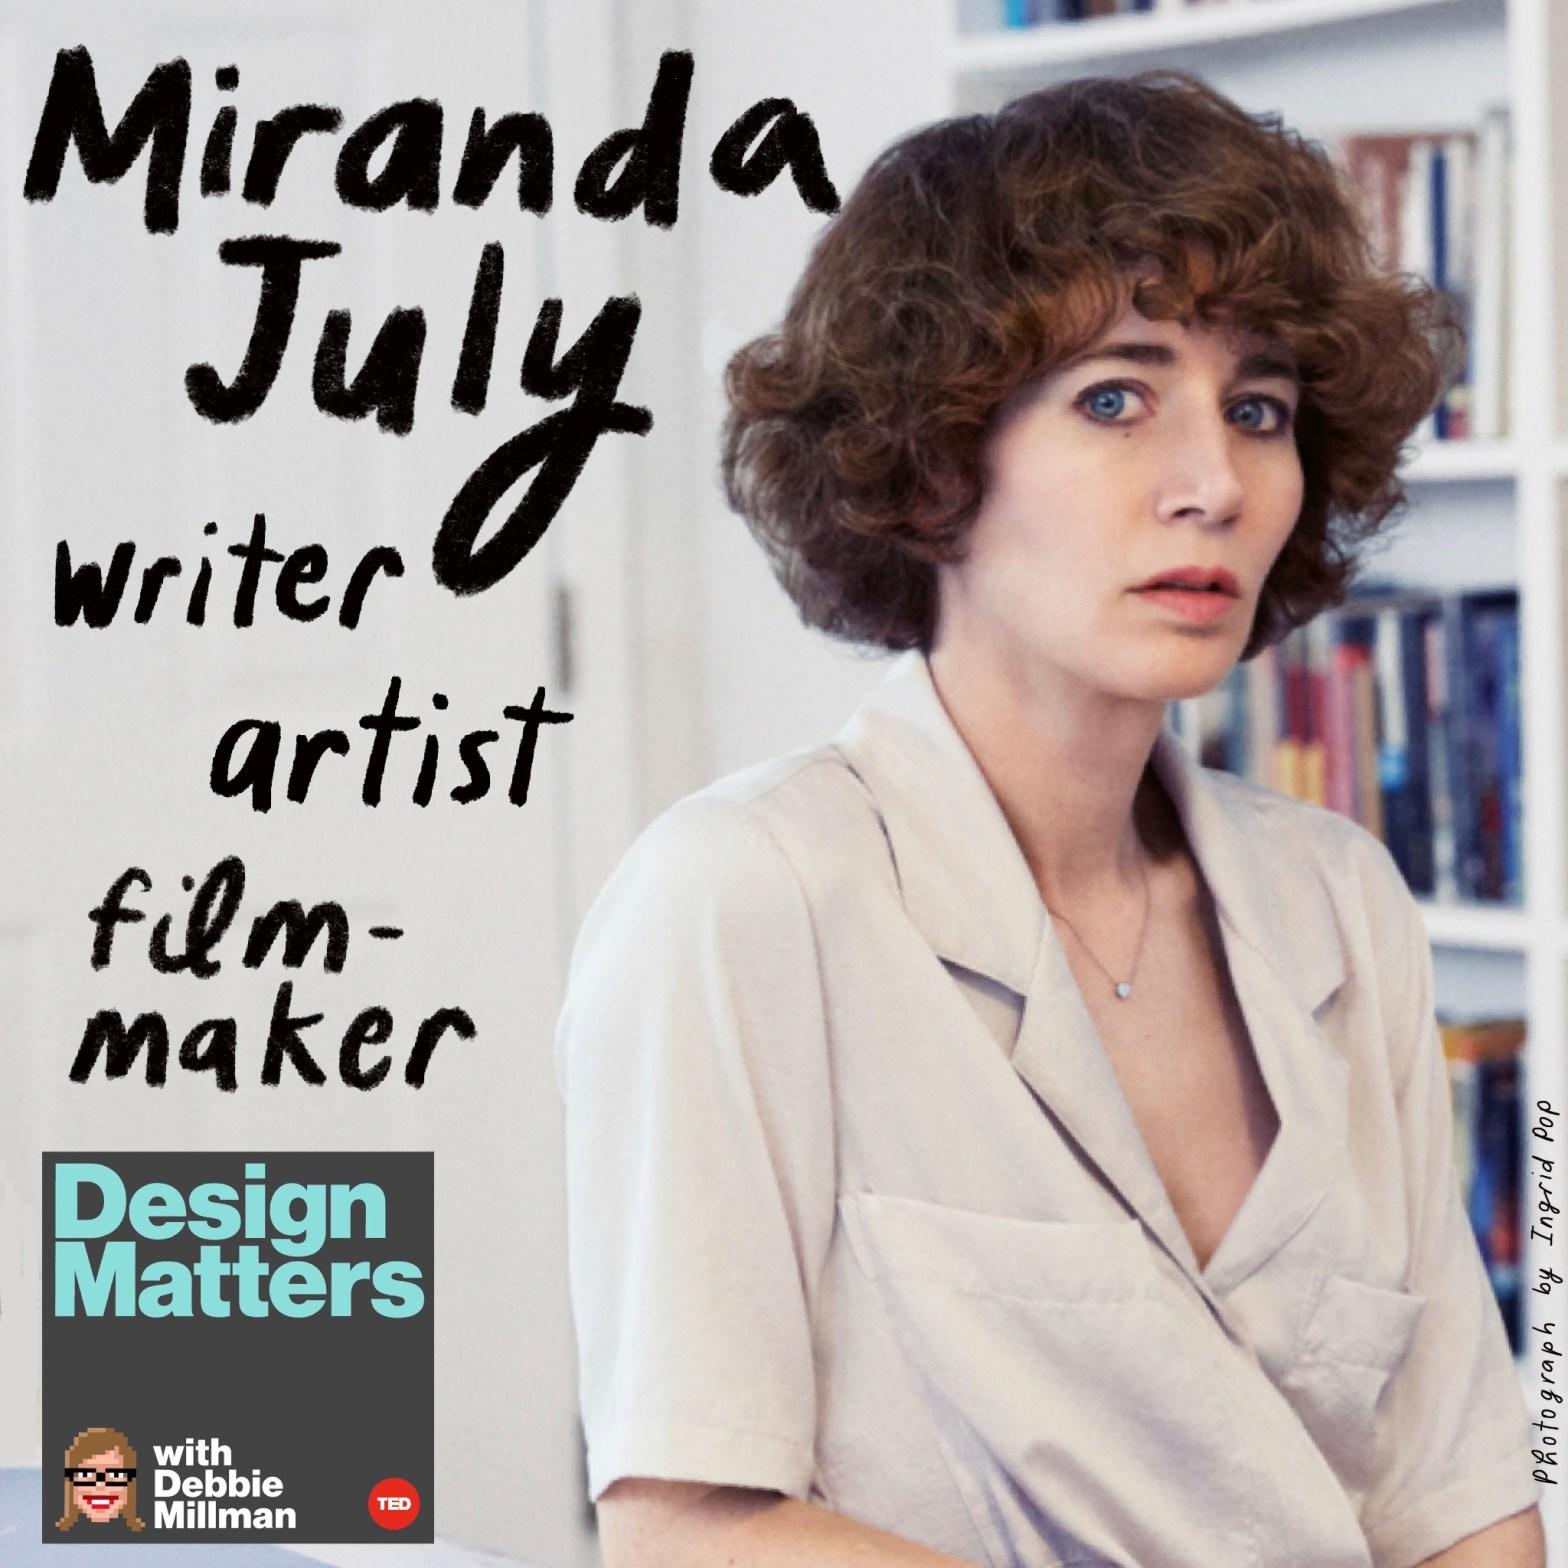 Thumbnail for Design Matters: Miranda July